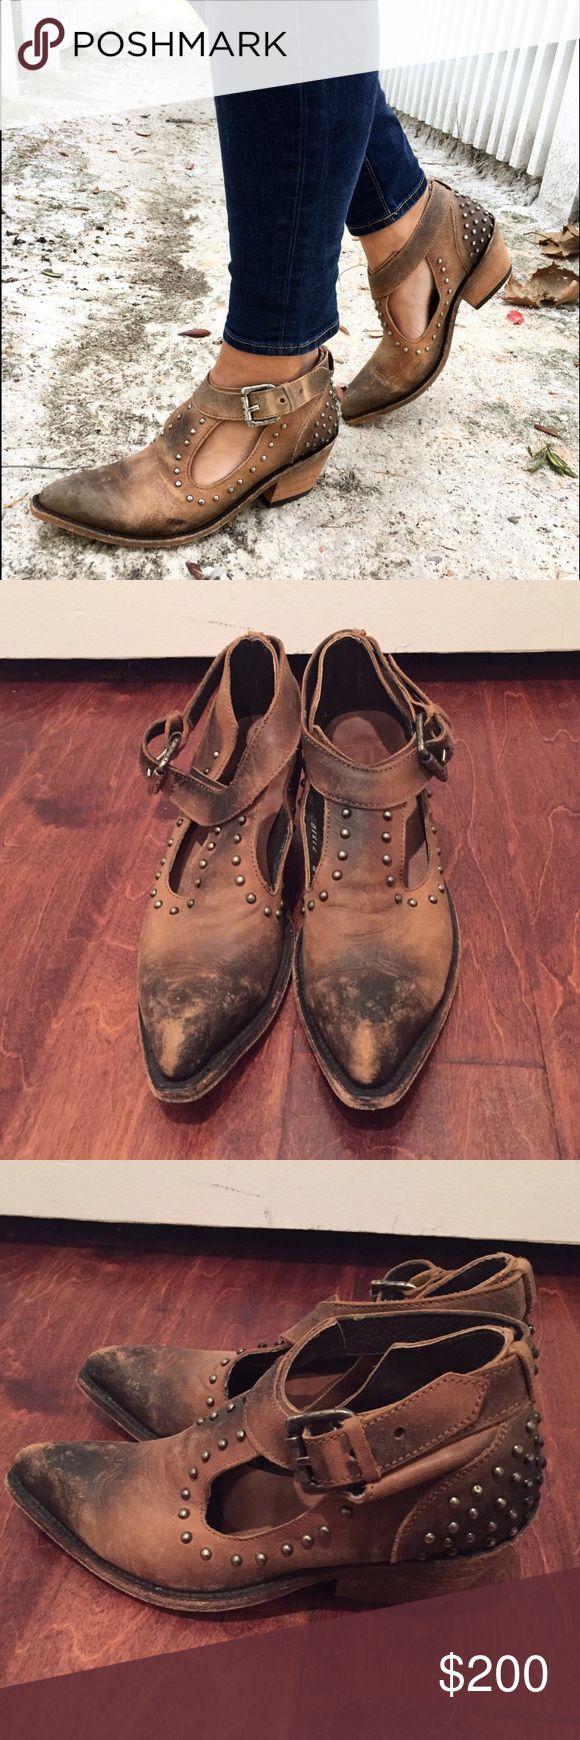 Best 25 Studded Ankle Boots Ideas On Pinterest Rocker